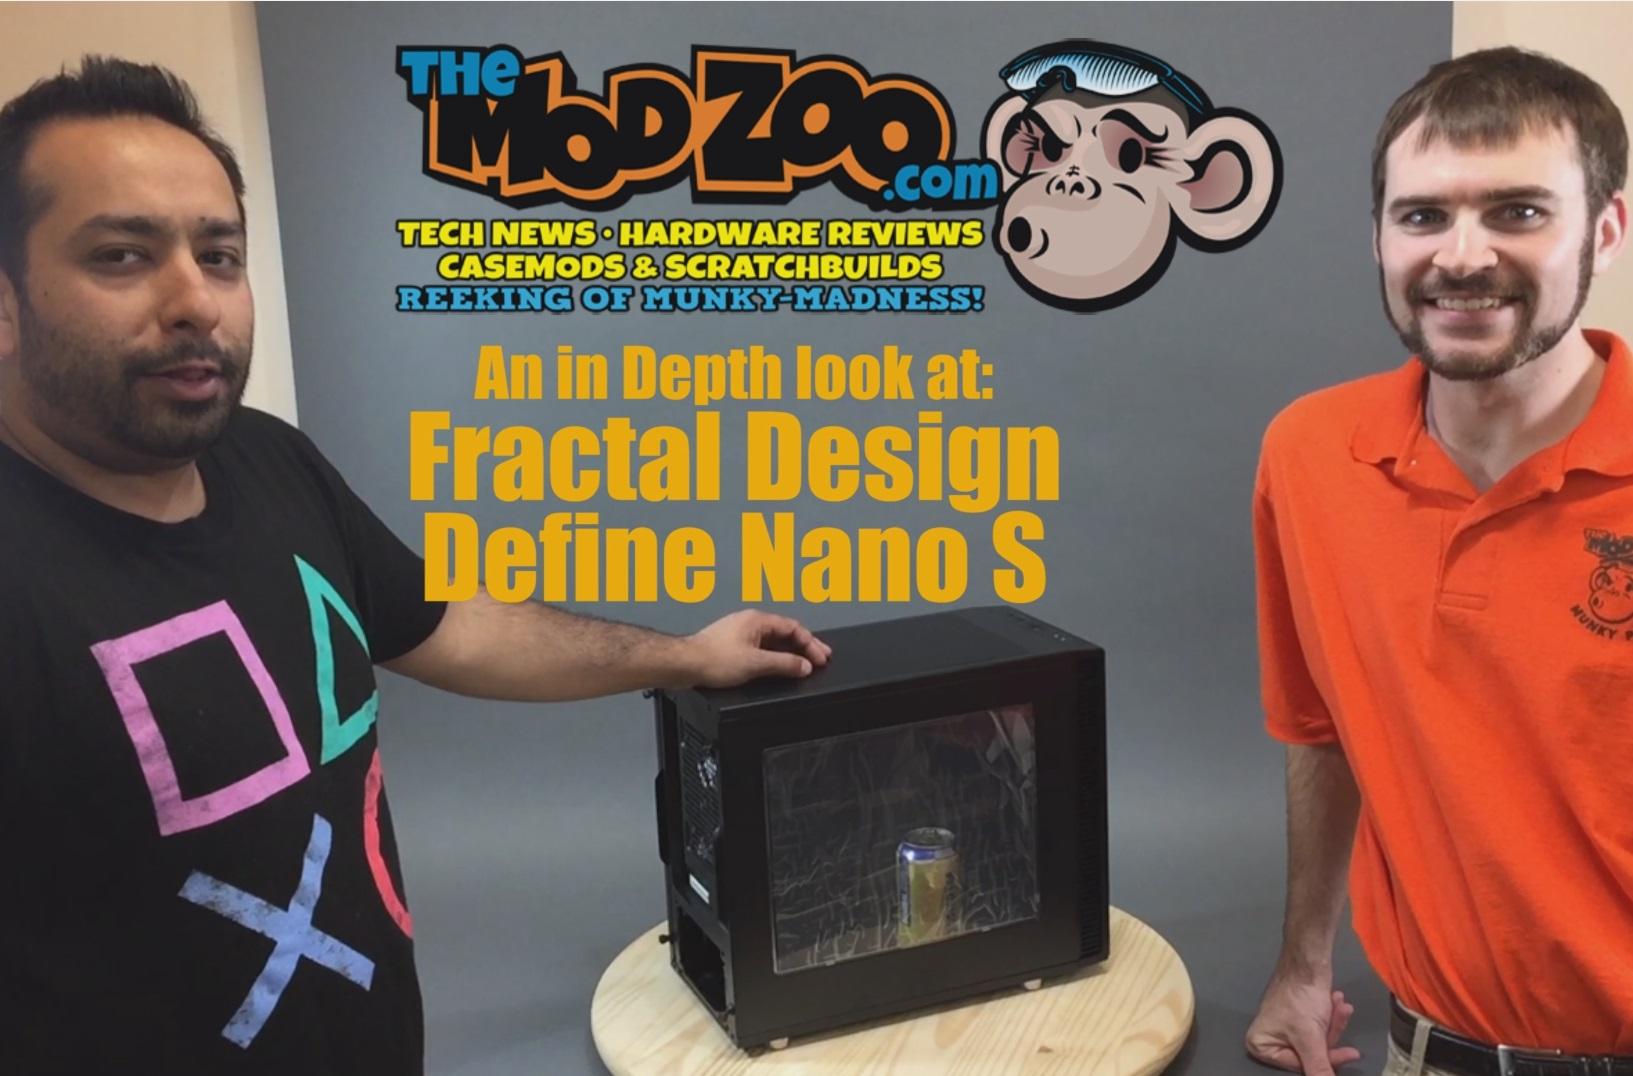 TheModZoo_Fracal_Design_Define_Nano_S